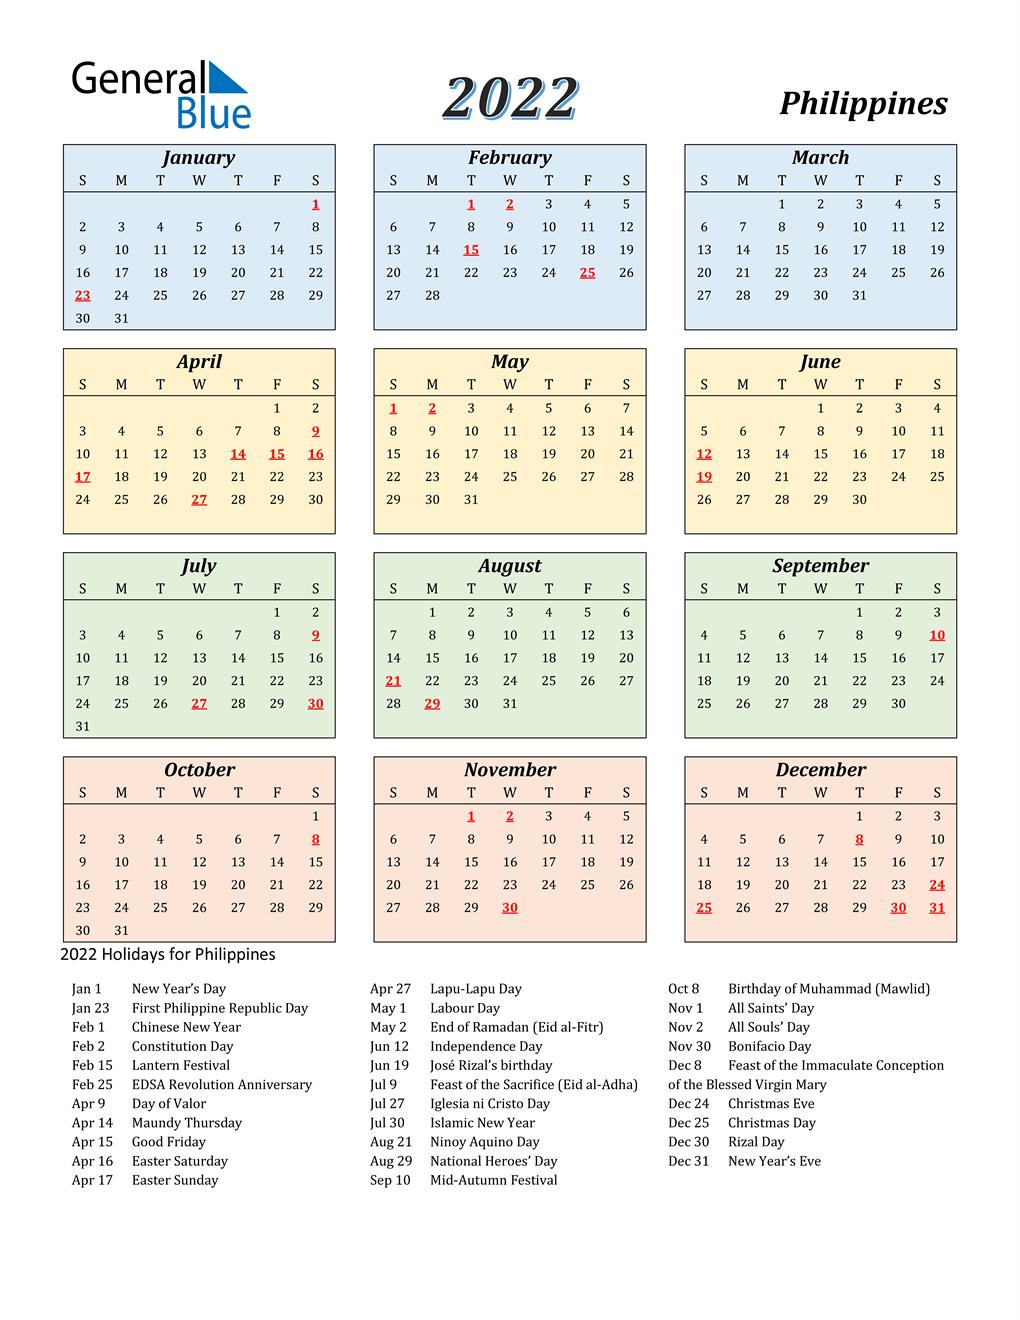 2022 Calendar With Holidays.2022 Philippines Calendar With Holidays